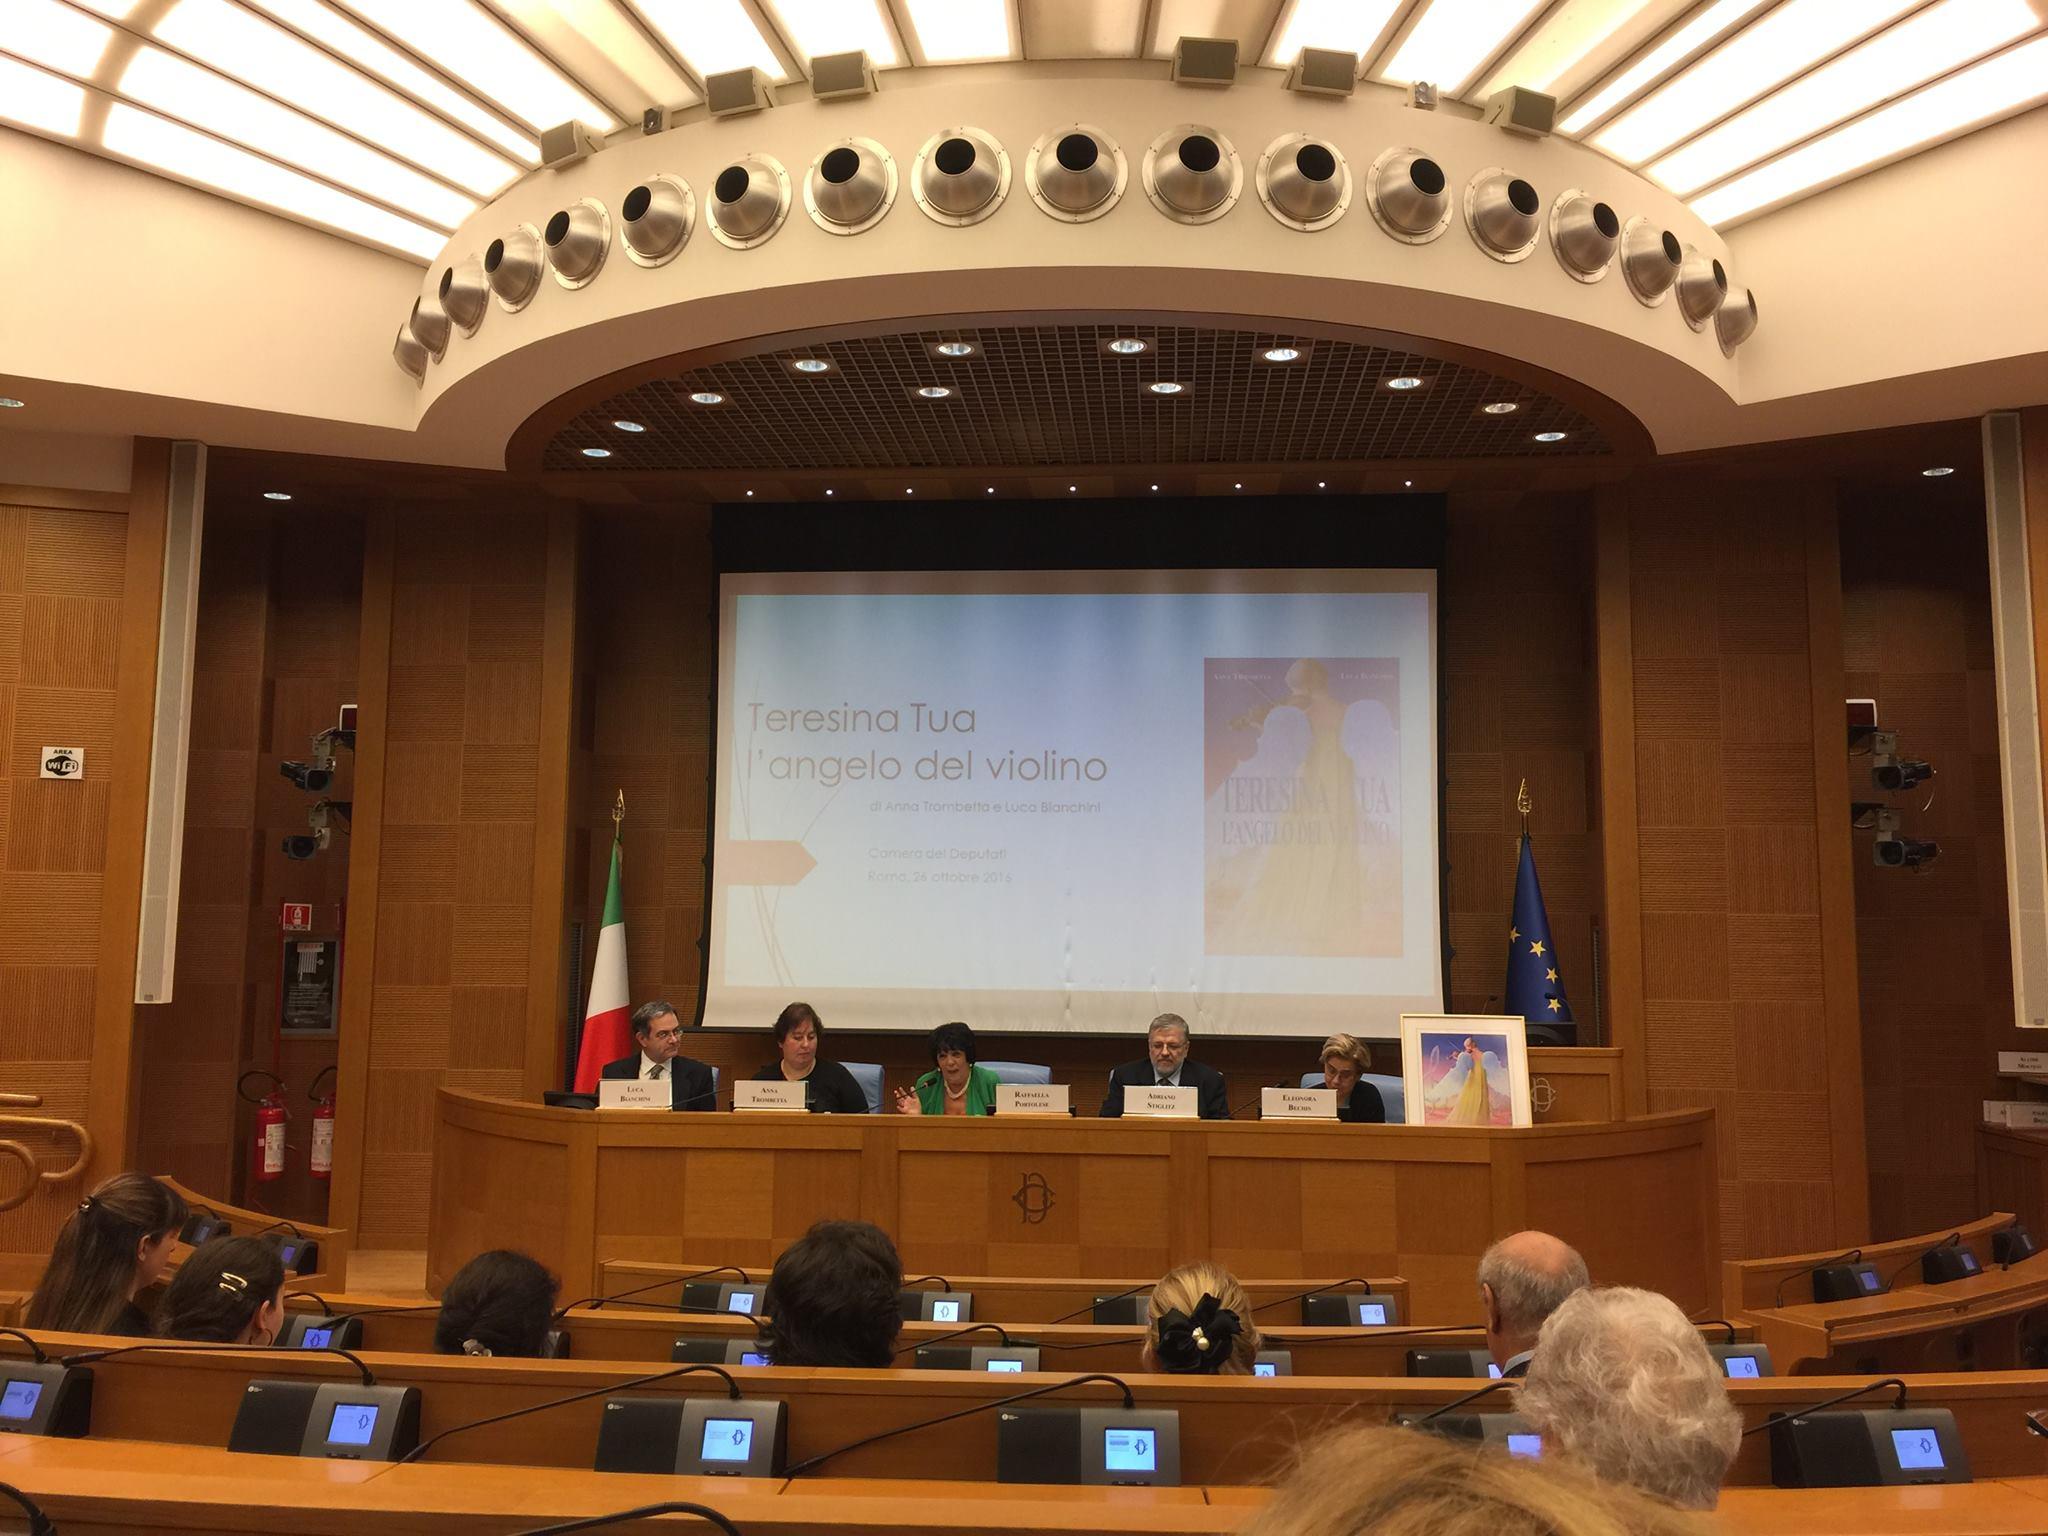 About italianopera for Biblioteca camera dei deputati